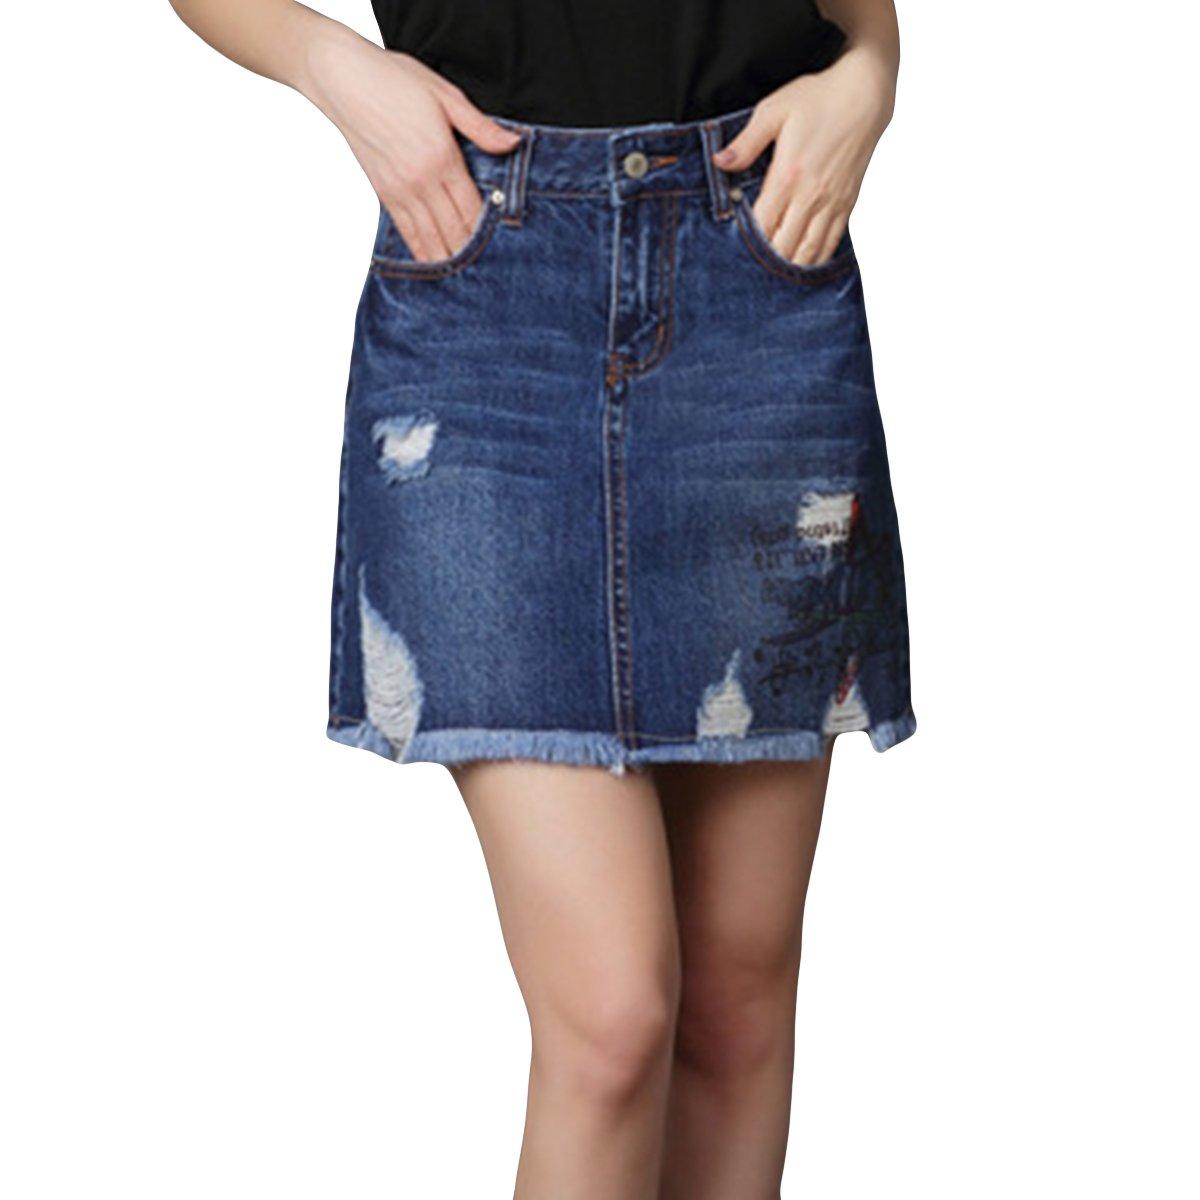 Cekaso Women's Denim High Waist Short Distressed Jean Ripped Printed Casual Skirt, Dark Blue, USsize10-12=TagszieXXL